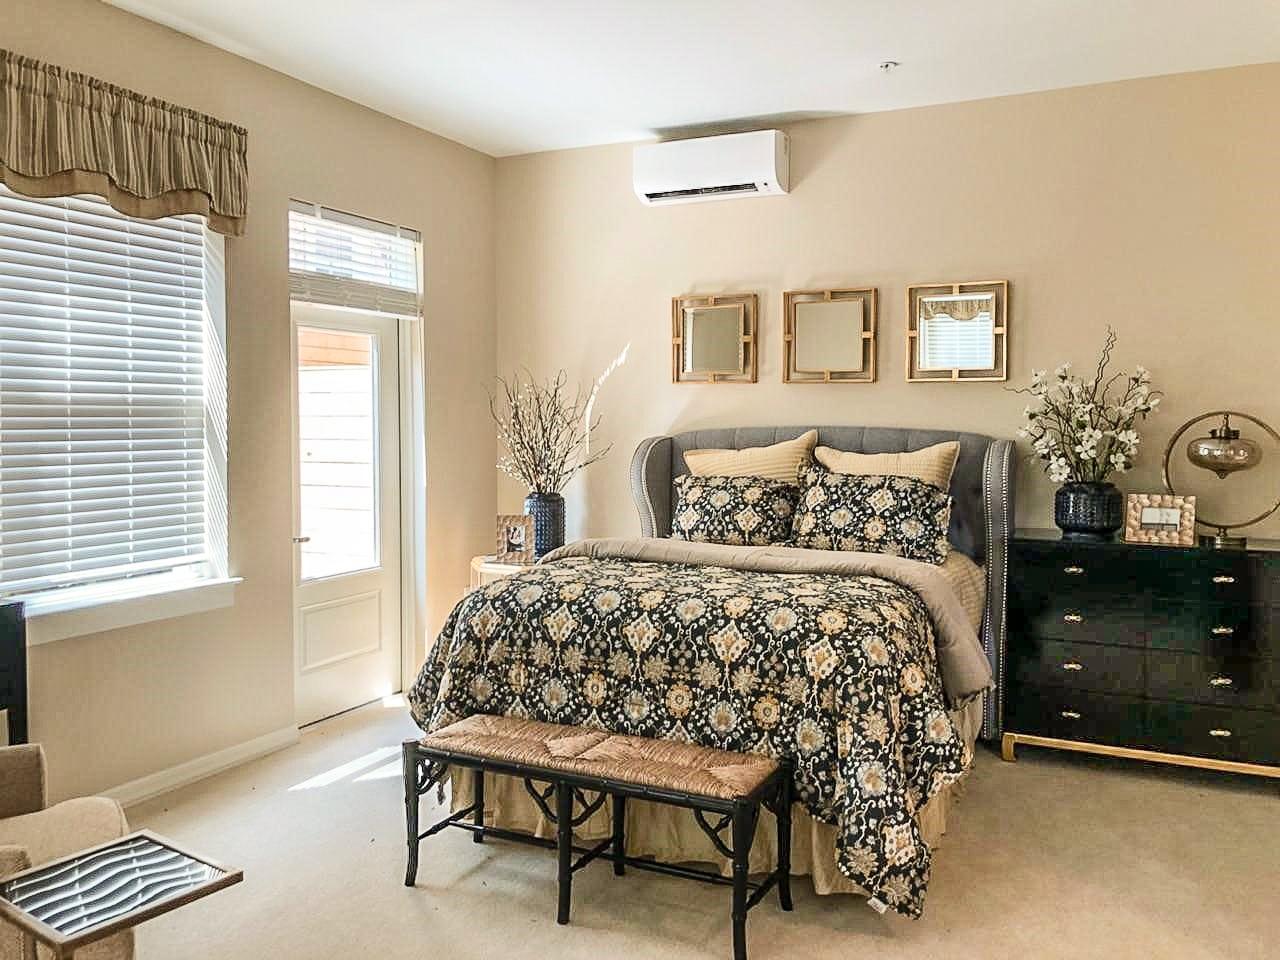 Washington DC Senior Living facility model bedroom